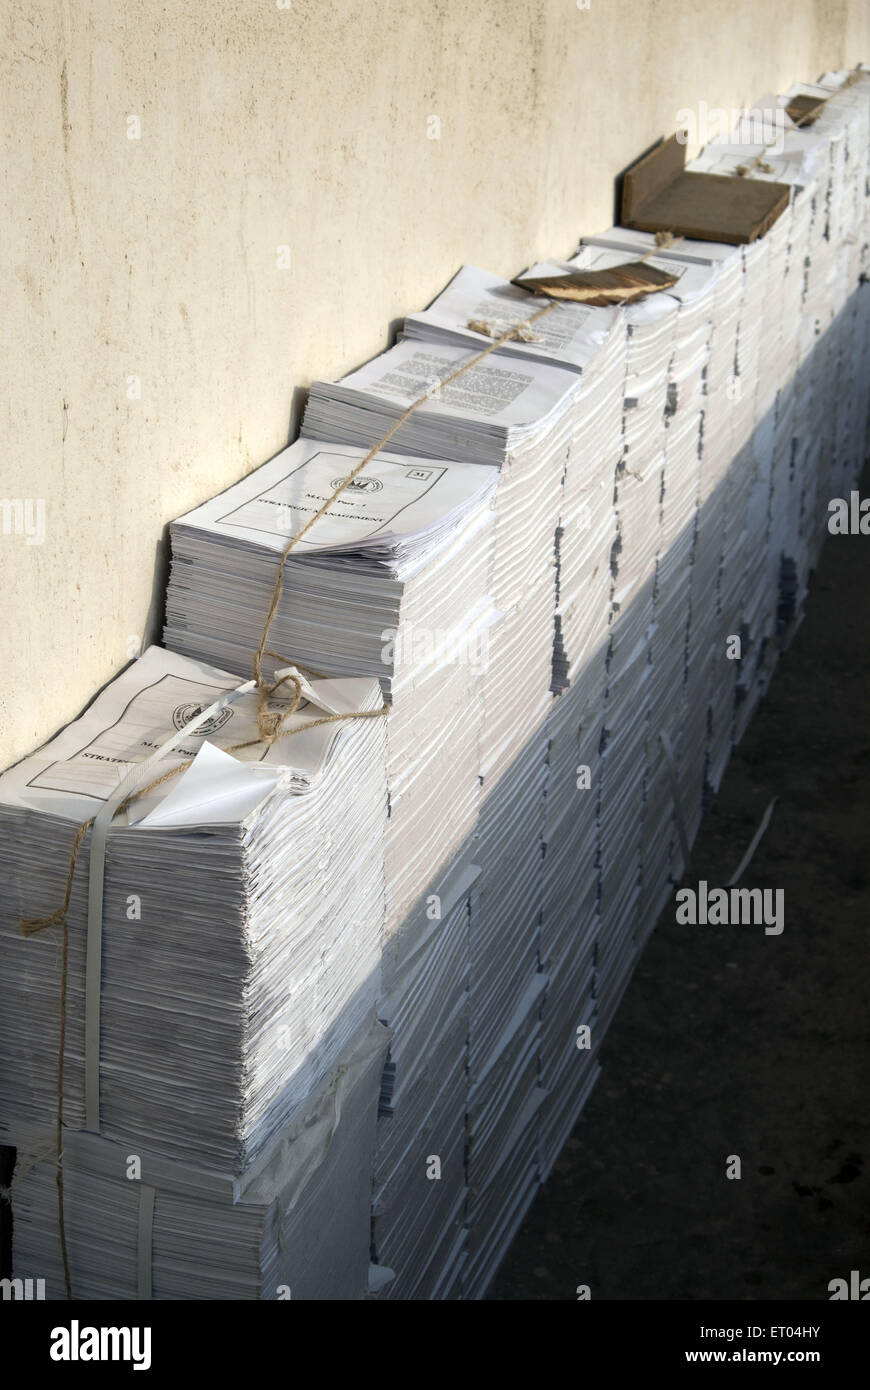 Gedrucktes Material gestapelt im Balocny Gewerbegebiet Mumbai Indien Stockbild